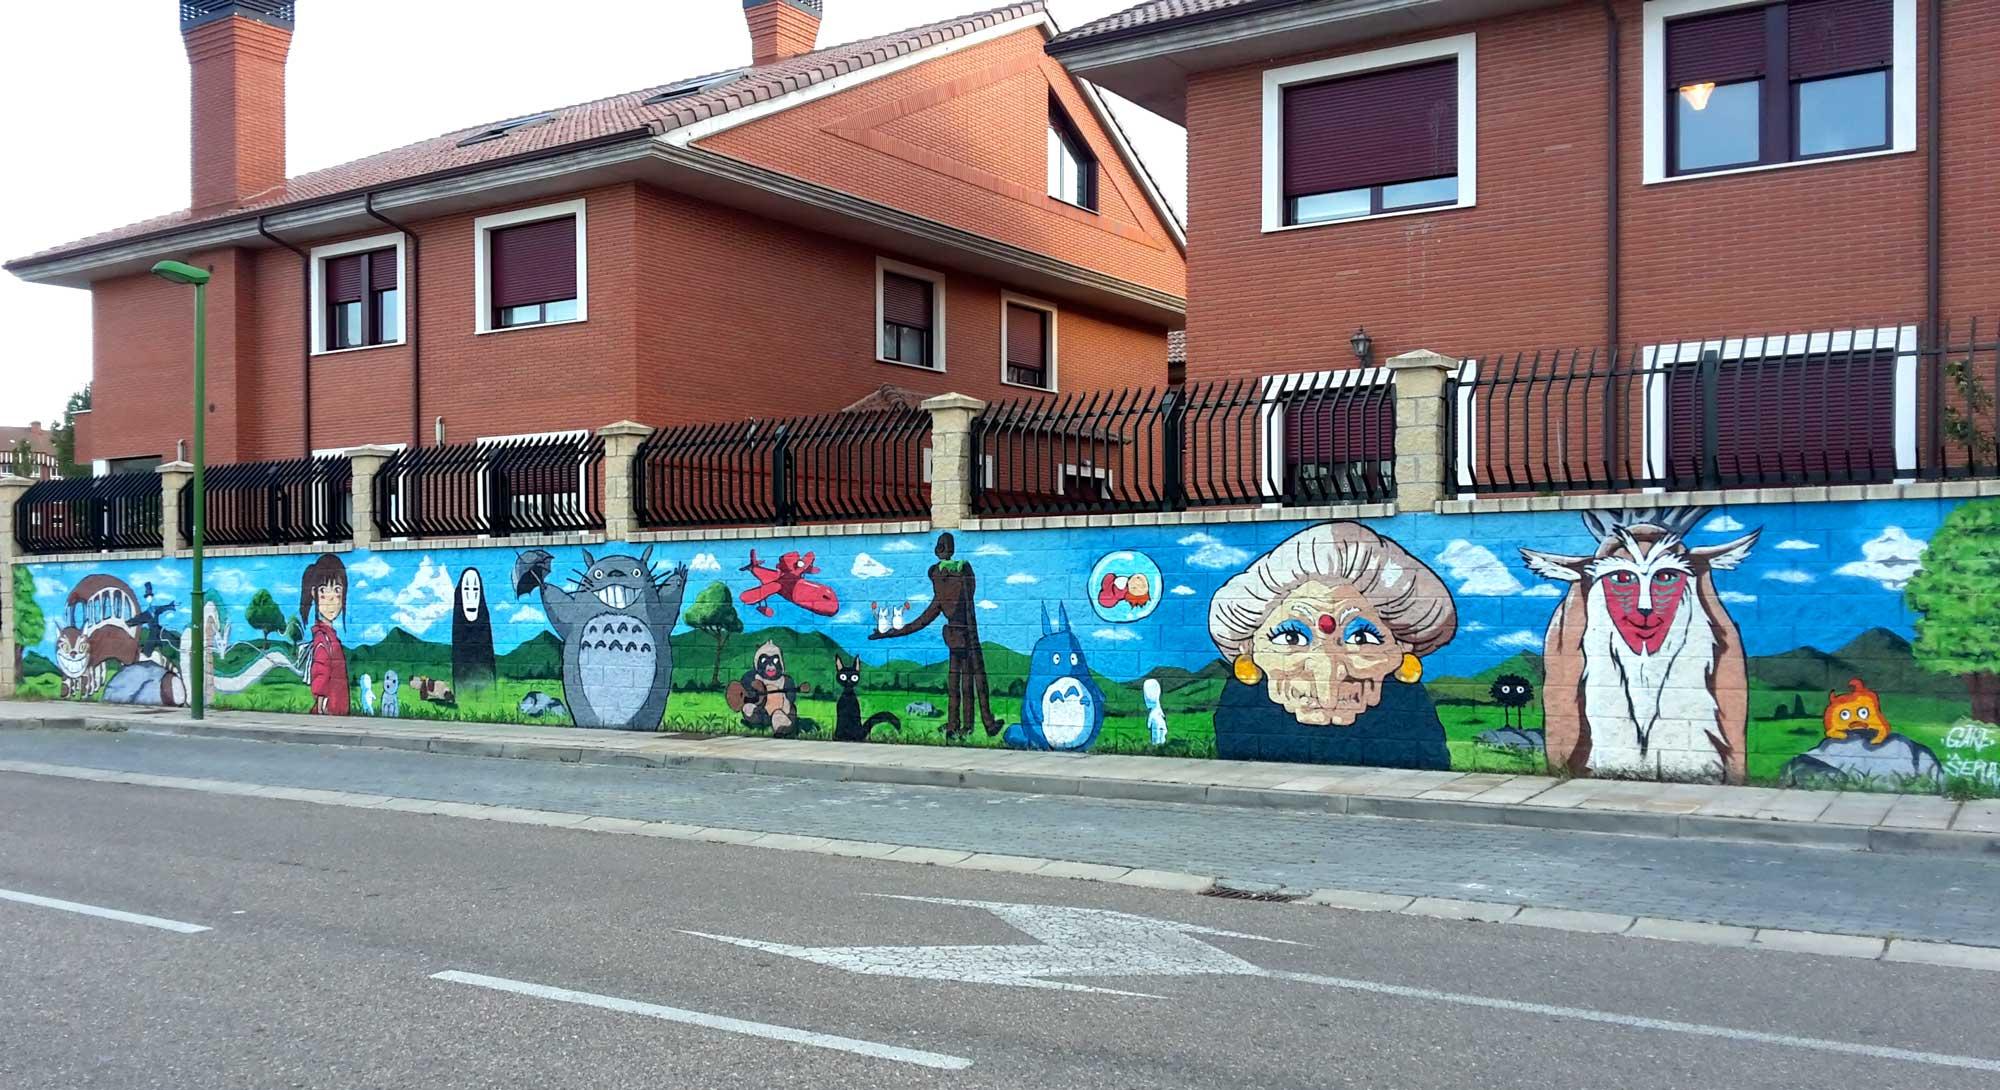 mural ghibli